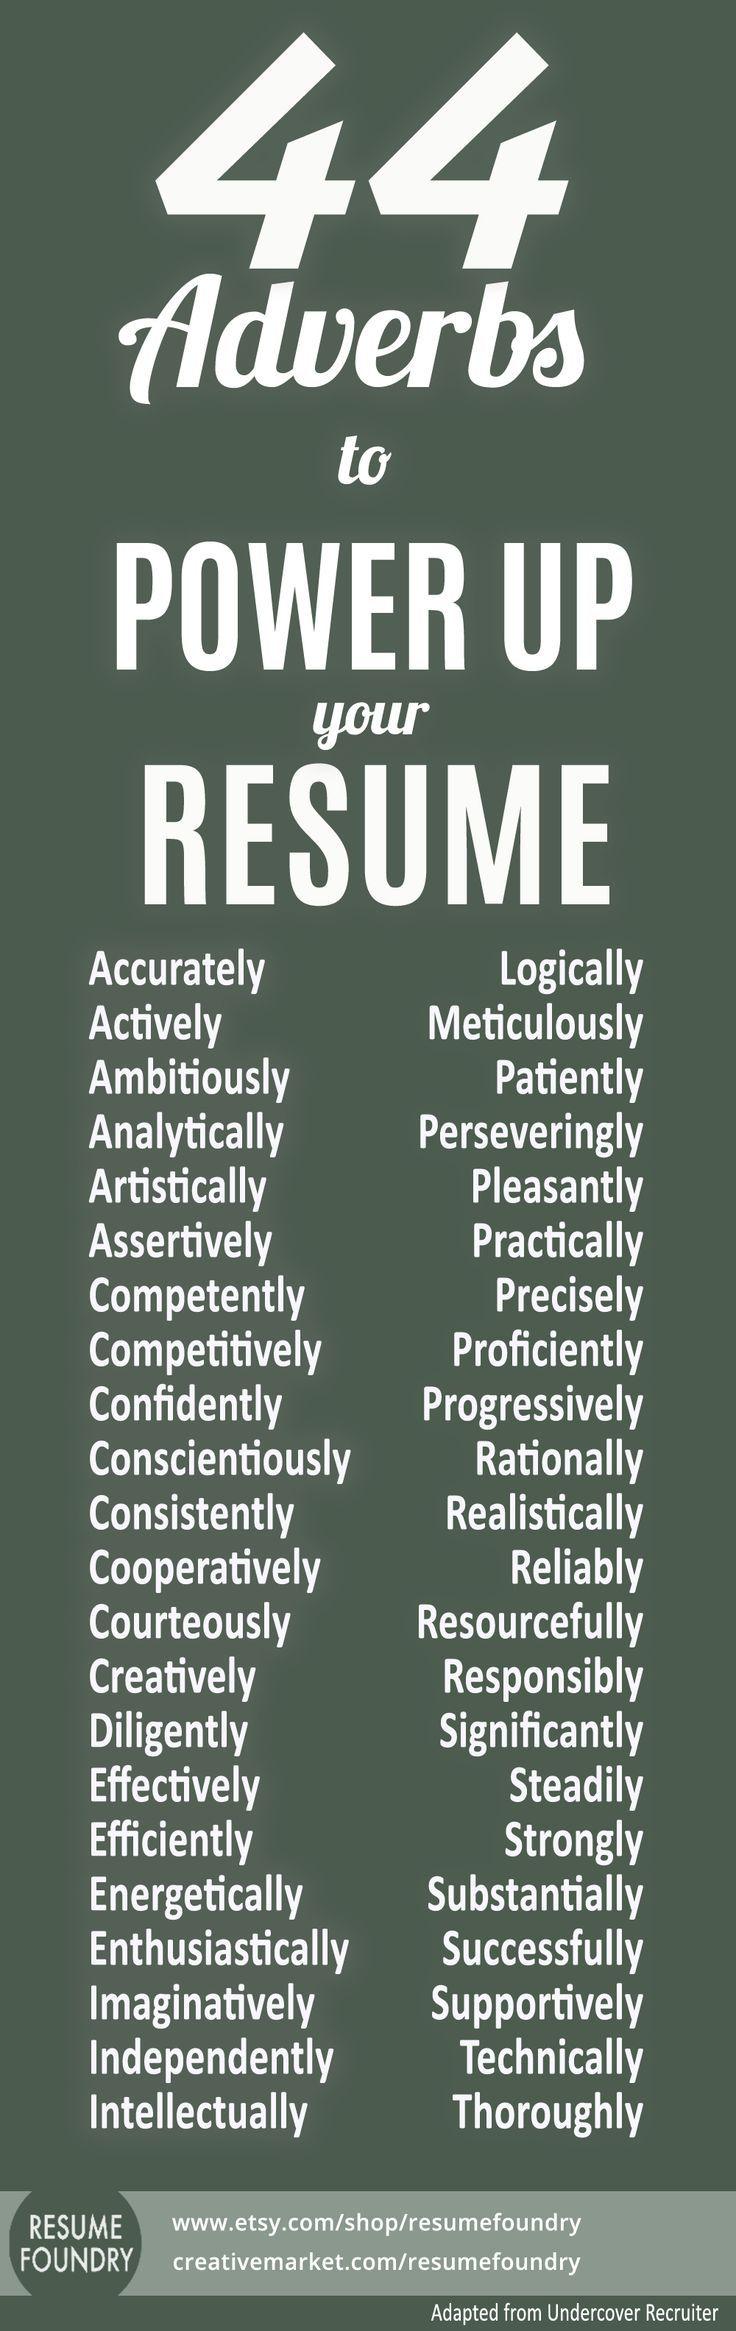 Resume tips, resume skill words, resume verbs, resume experience ...